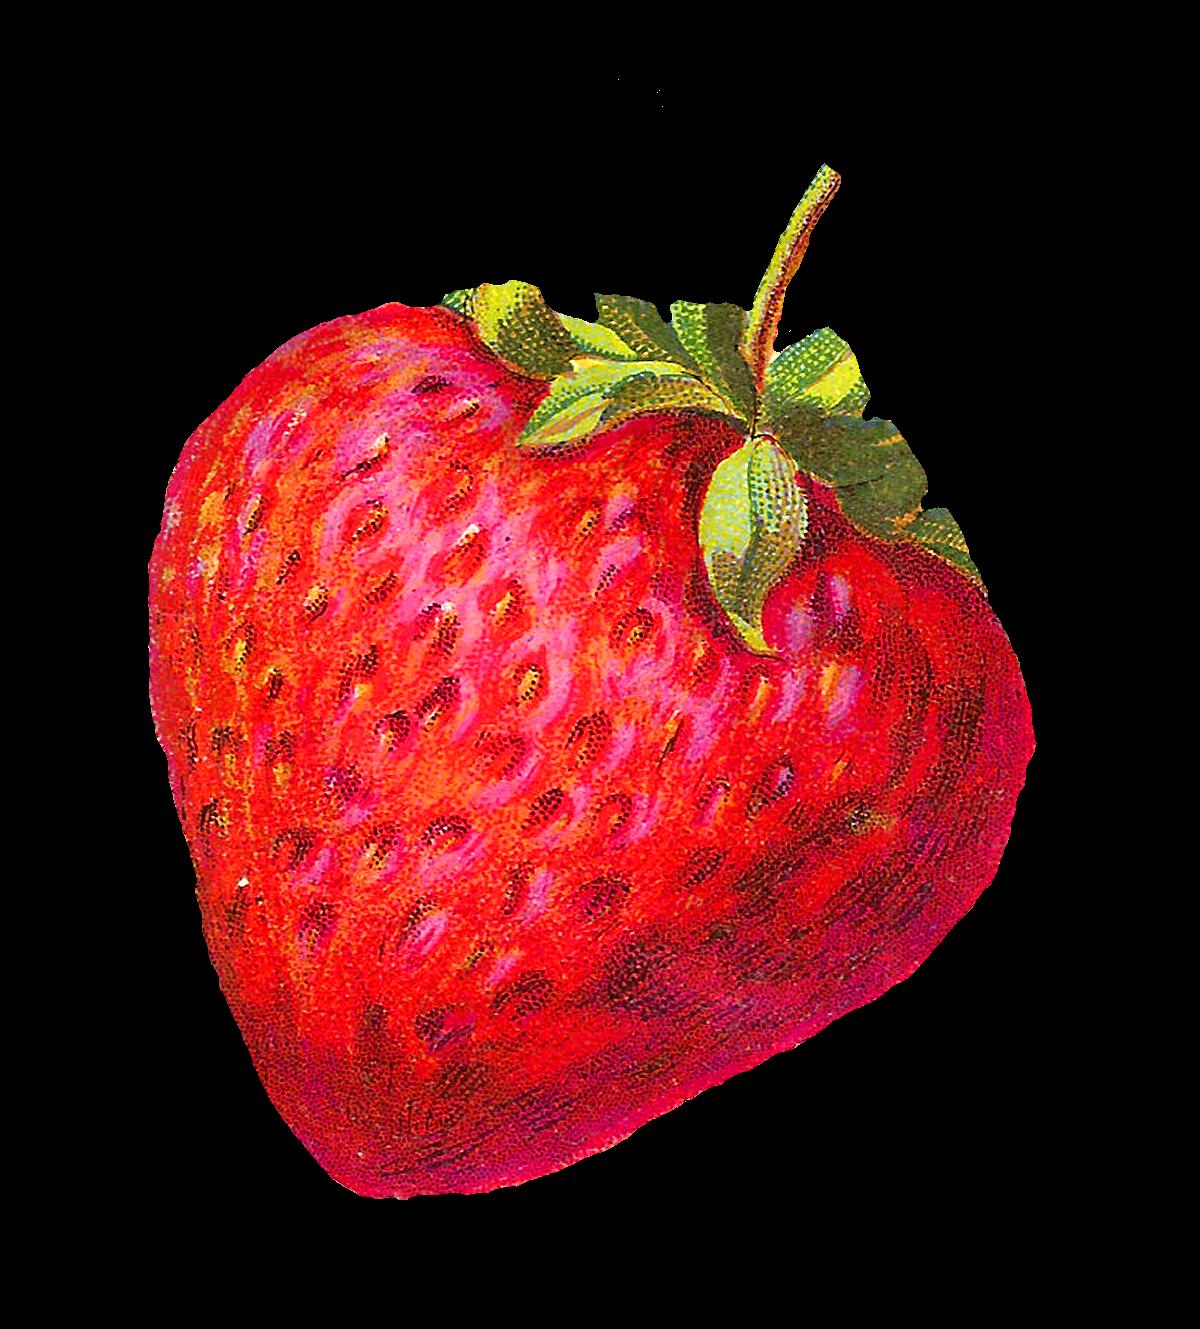 Antique Images Digital Strawberry Clip Art Berry Fruit